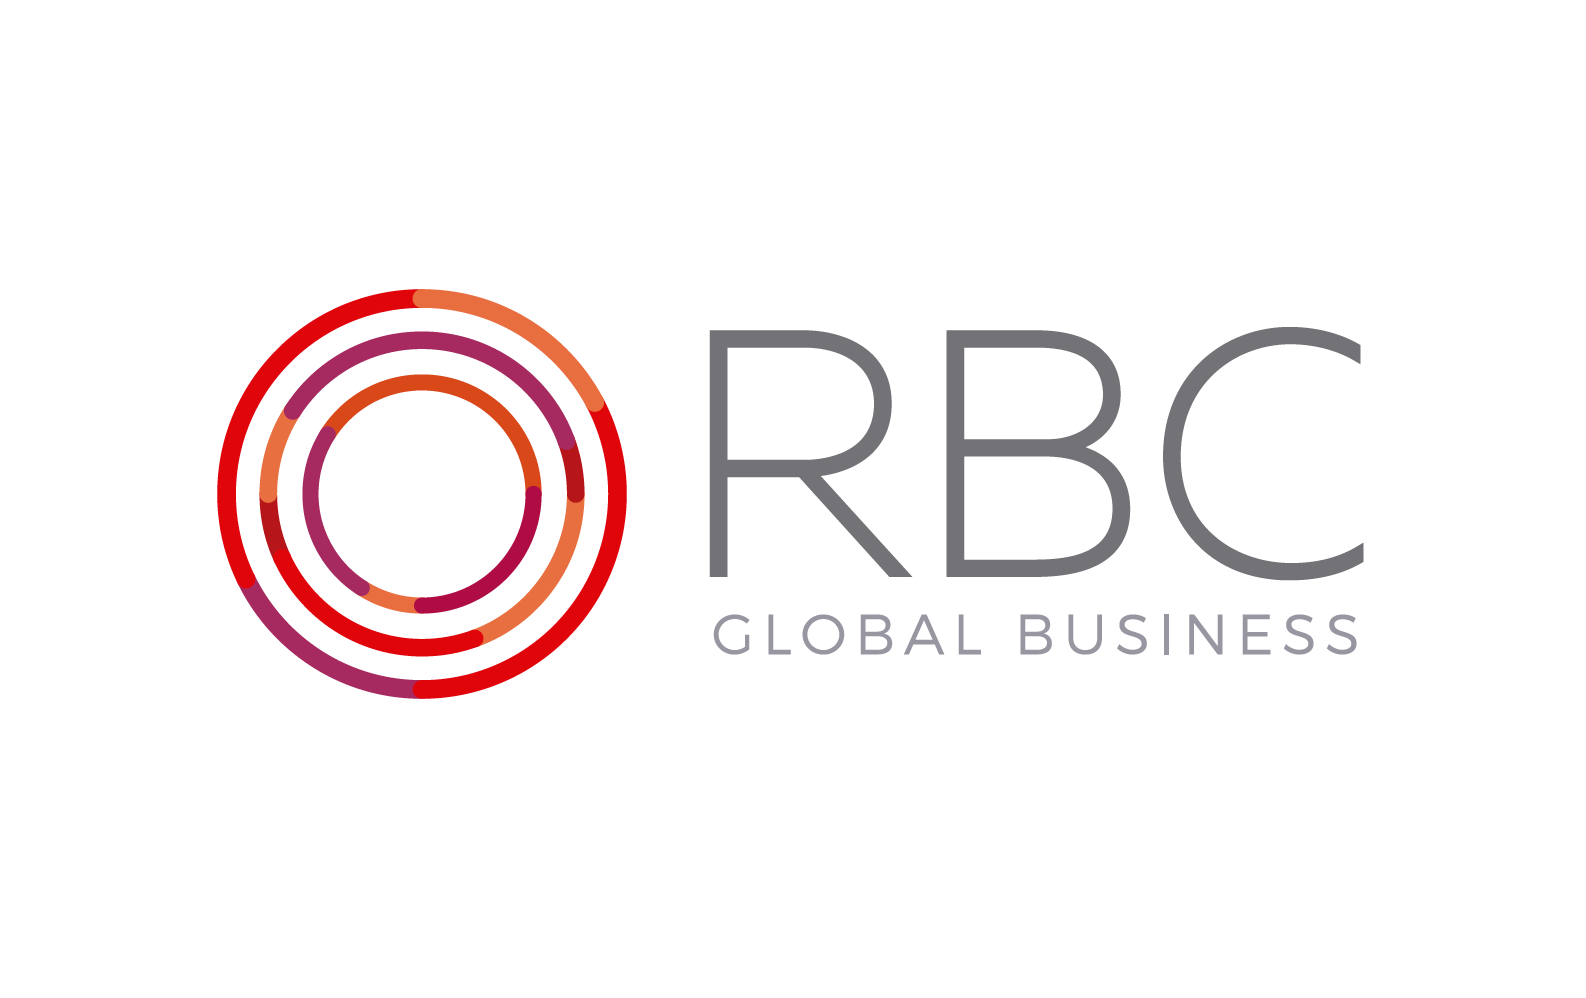 RBC GLOBAL